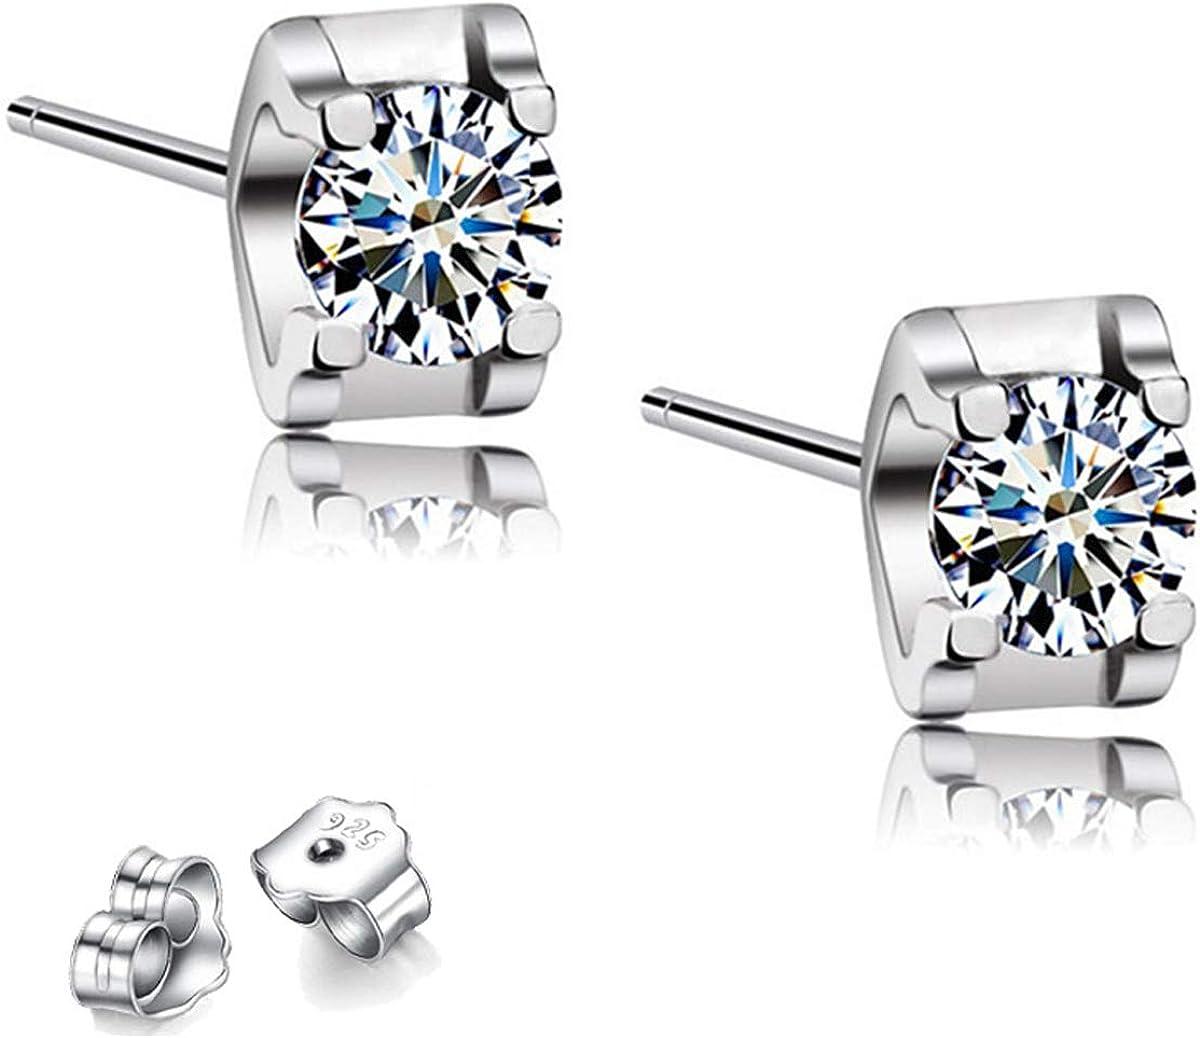 Cubic Zirconia Stud Earrings Max 81% OFF Max 83% OFF For Women Man 925 Sterlin Boy Girls